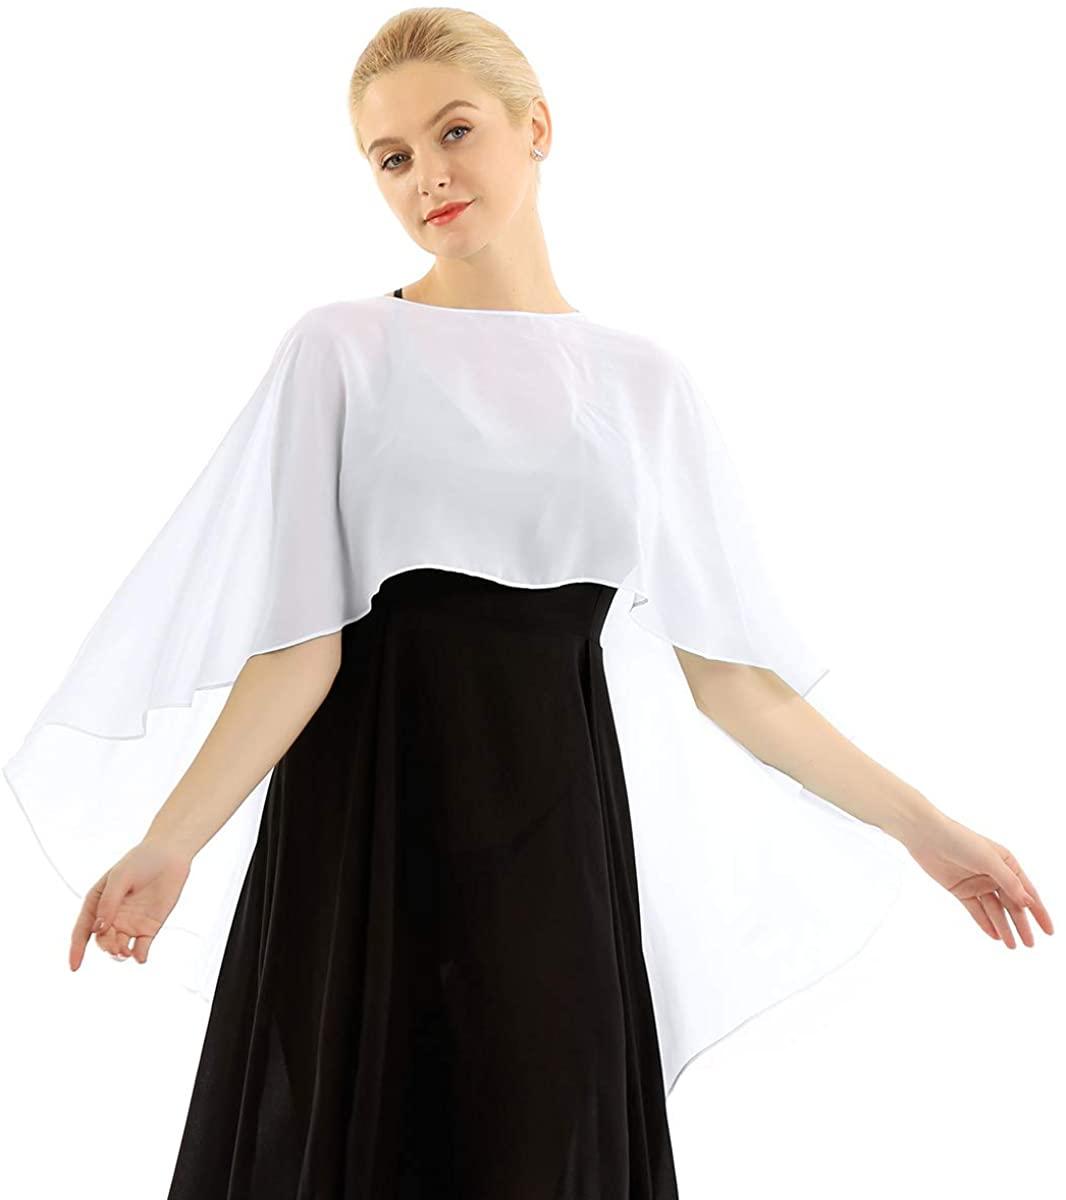 YiZYiF Women's Chiffon Scarves High-Low Wraps Cover Up Wedding Bridal Capelet Evening Shawls